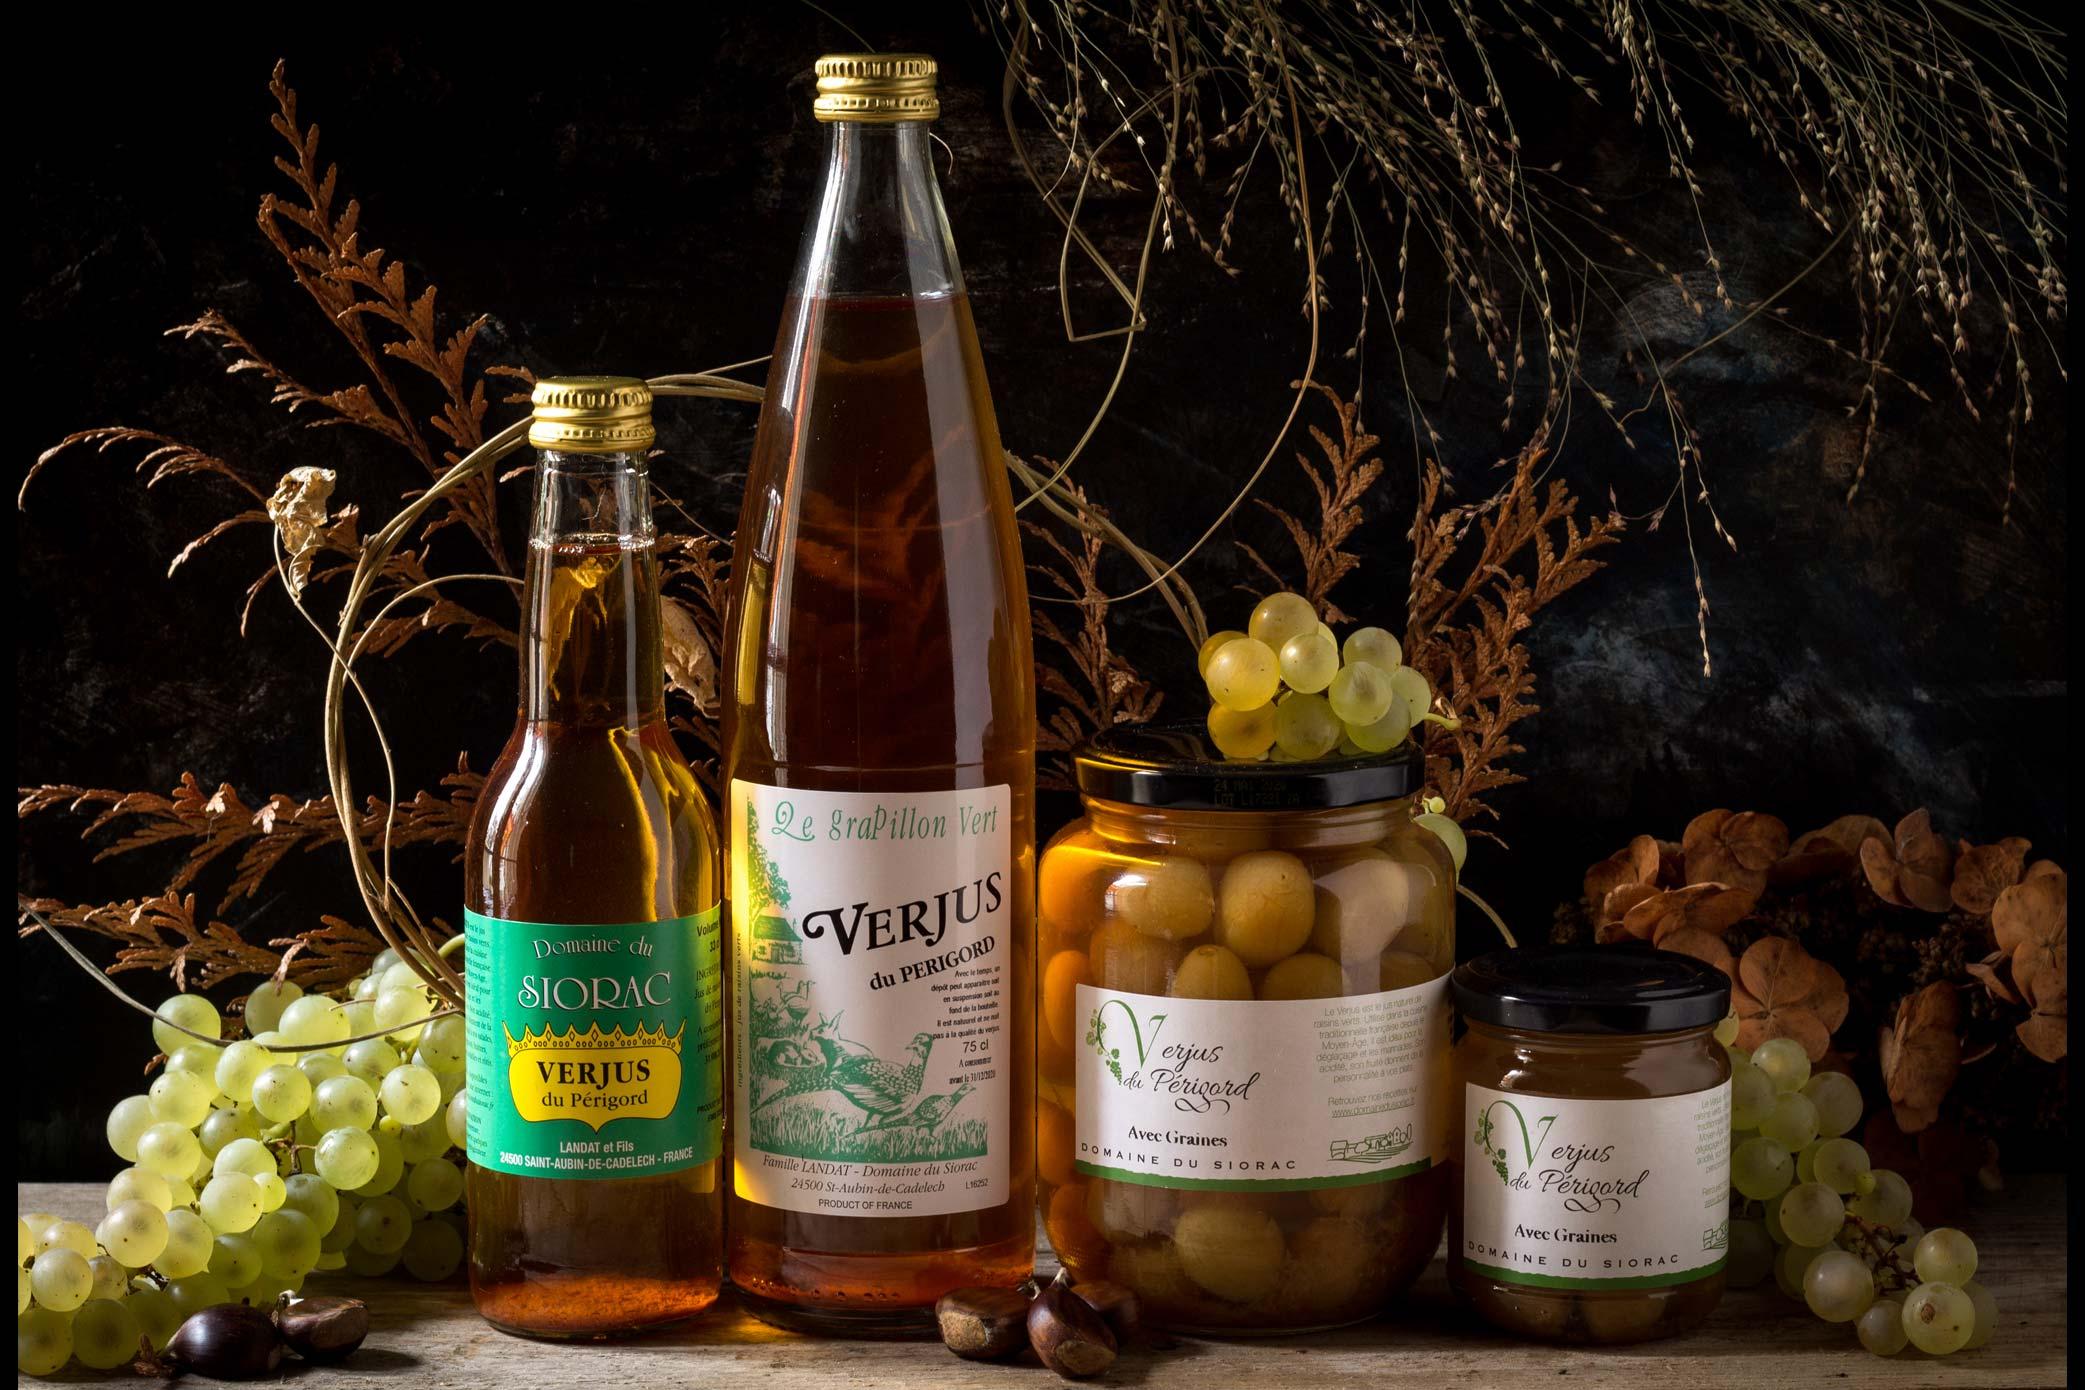 Verjus-2---Renards-Gourmets---Domaine-du-Siorac